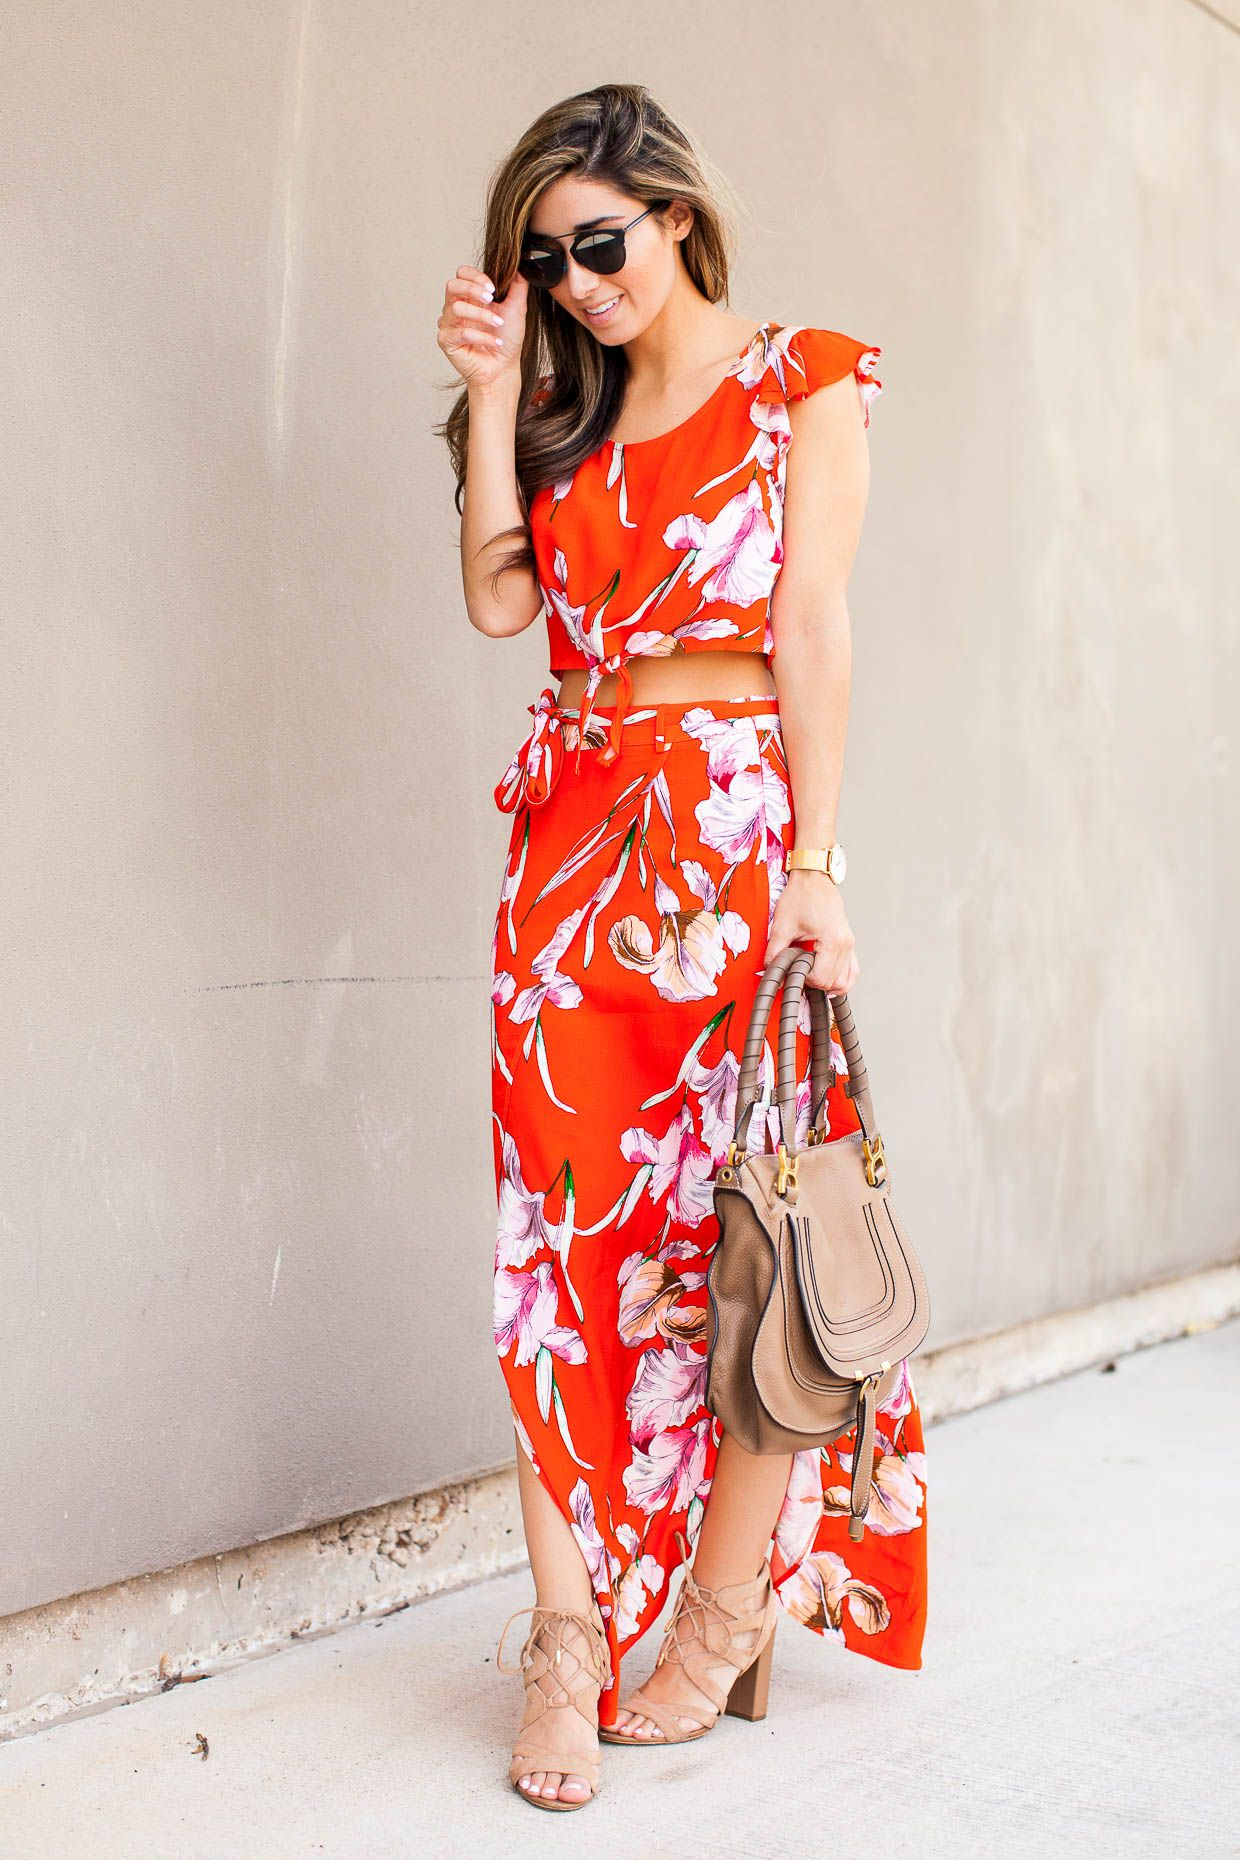 e9952cb7ddb Fashion blogger The Darling Detail carrying the Chloe Marcie Satchel ...